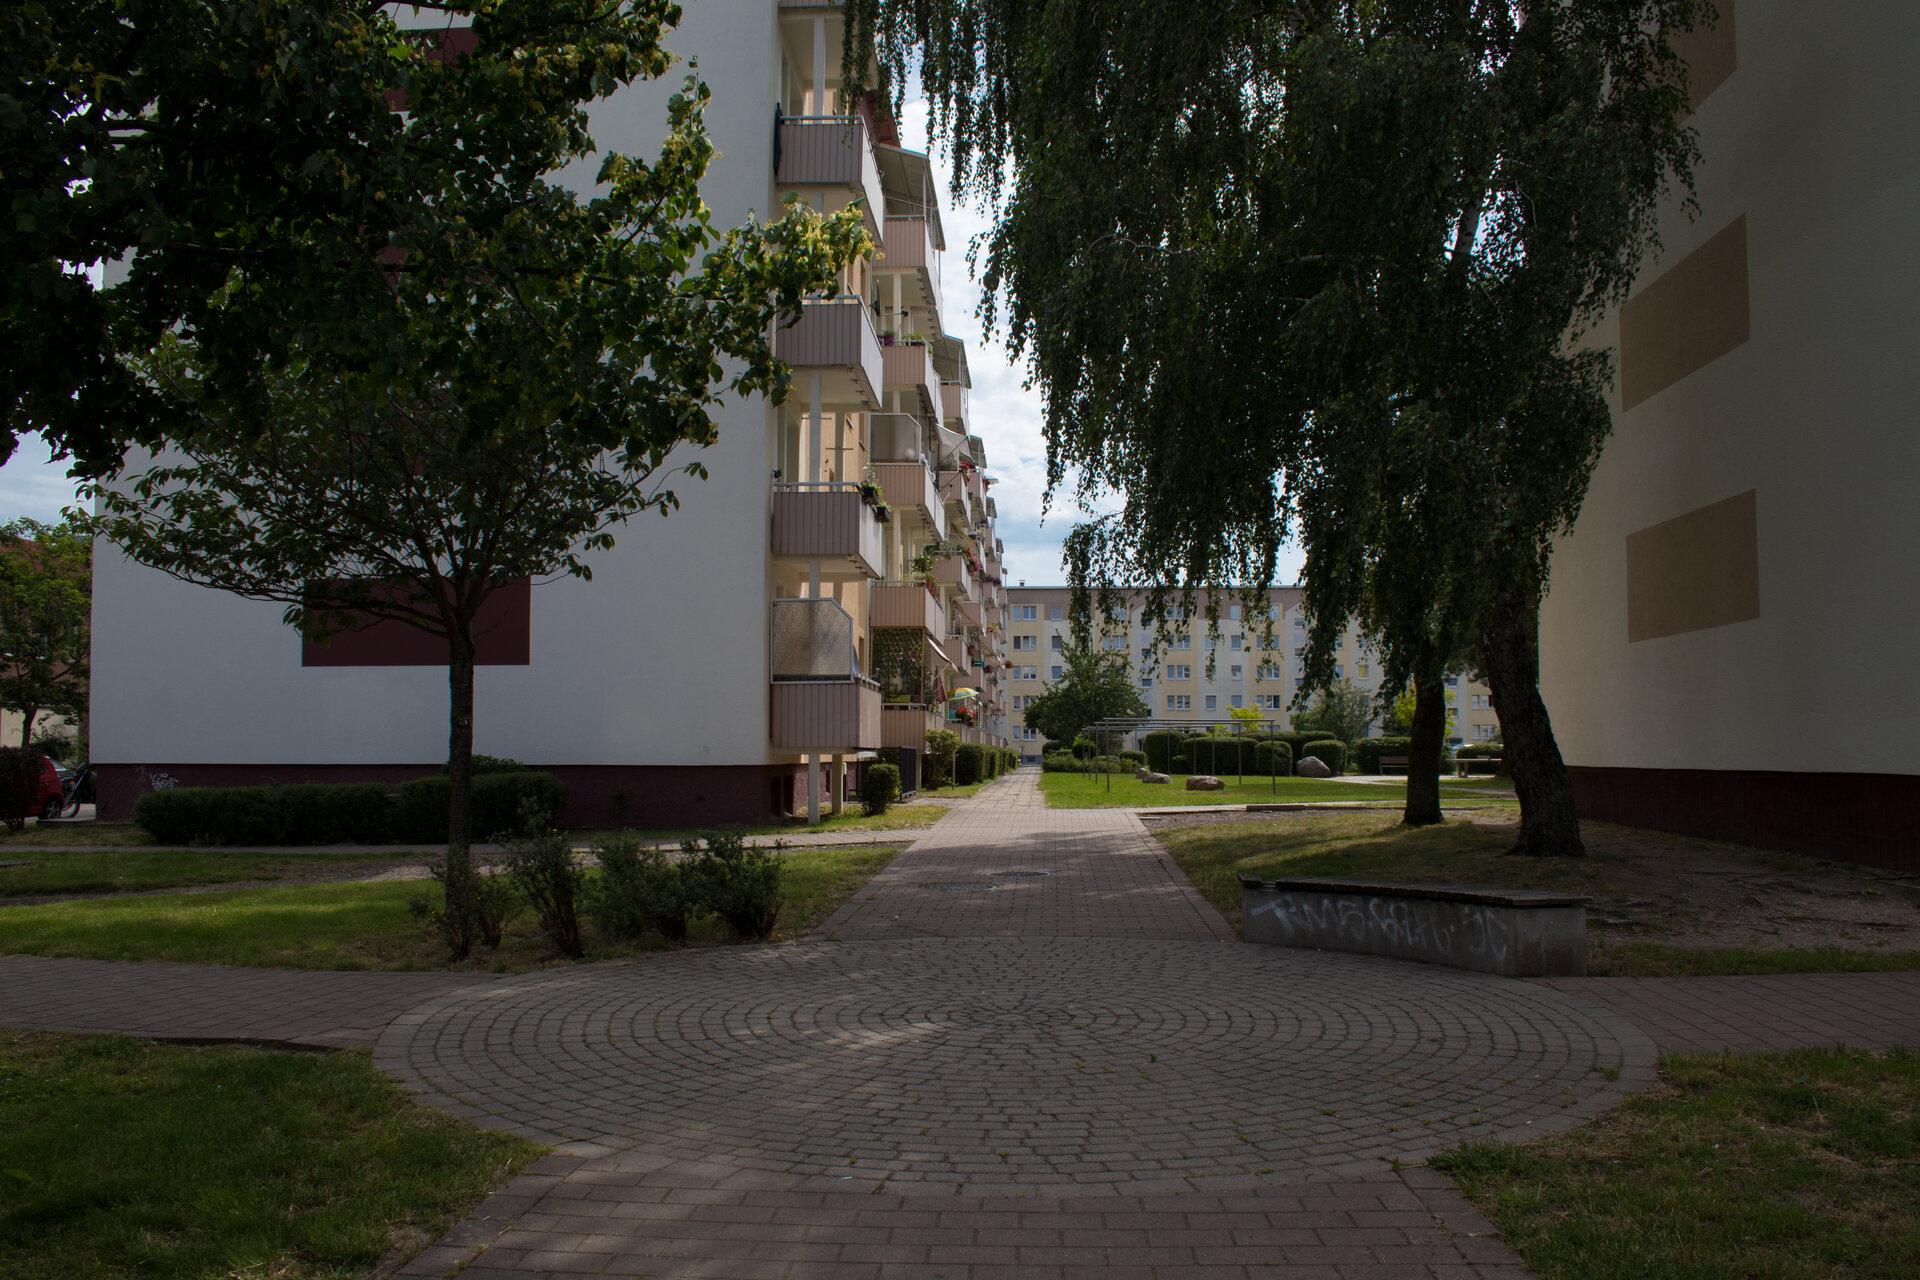 Brückenstr. 13-18 - Weg zum Innenhof